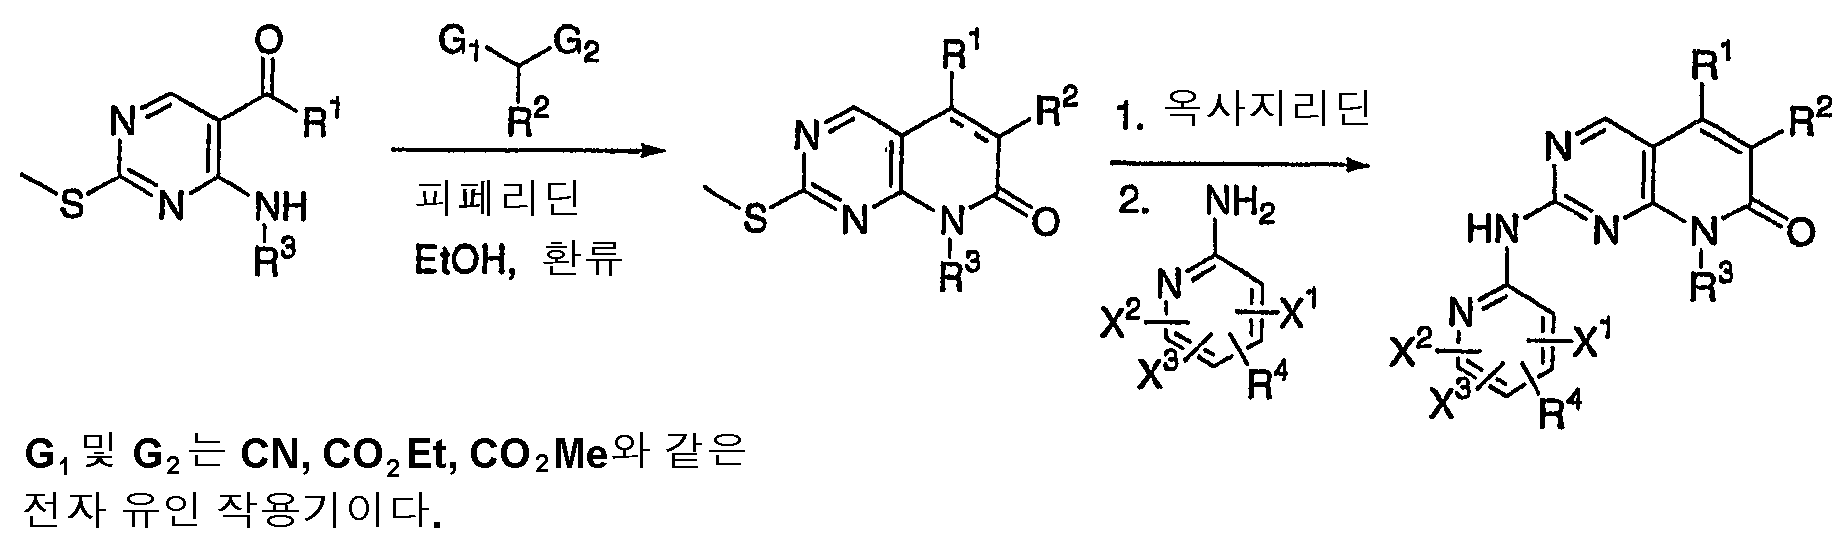 Figure 112004032346398-pct00012